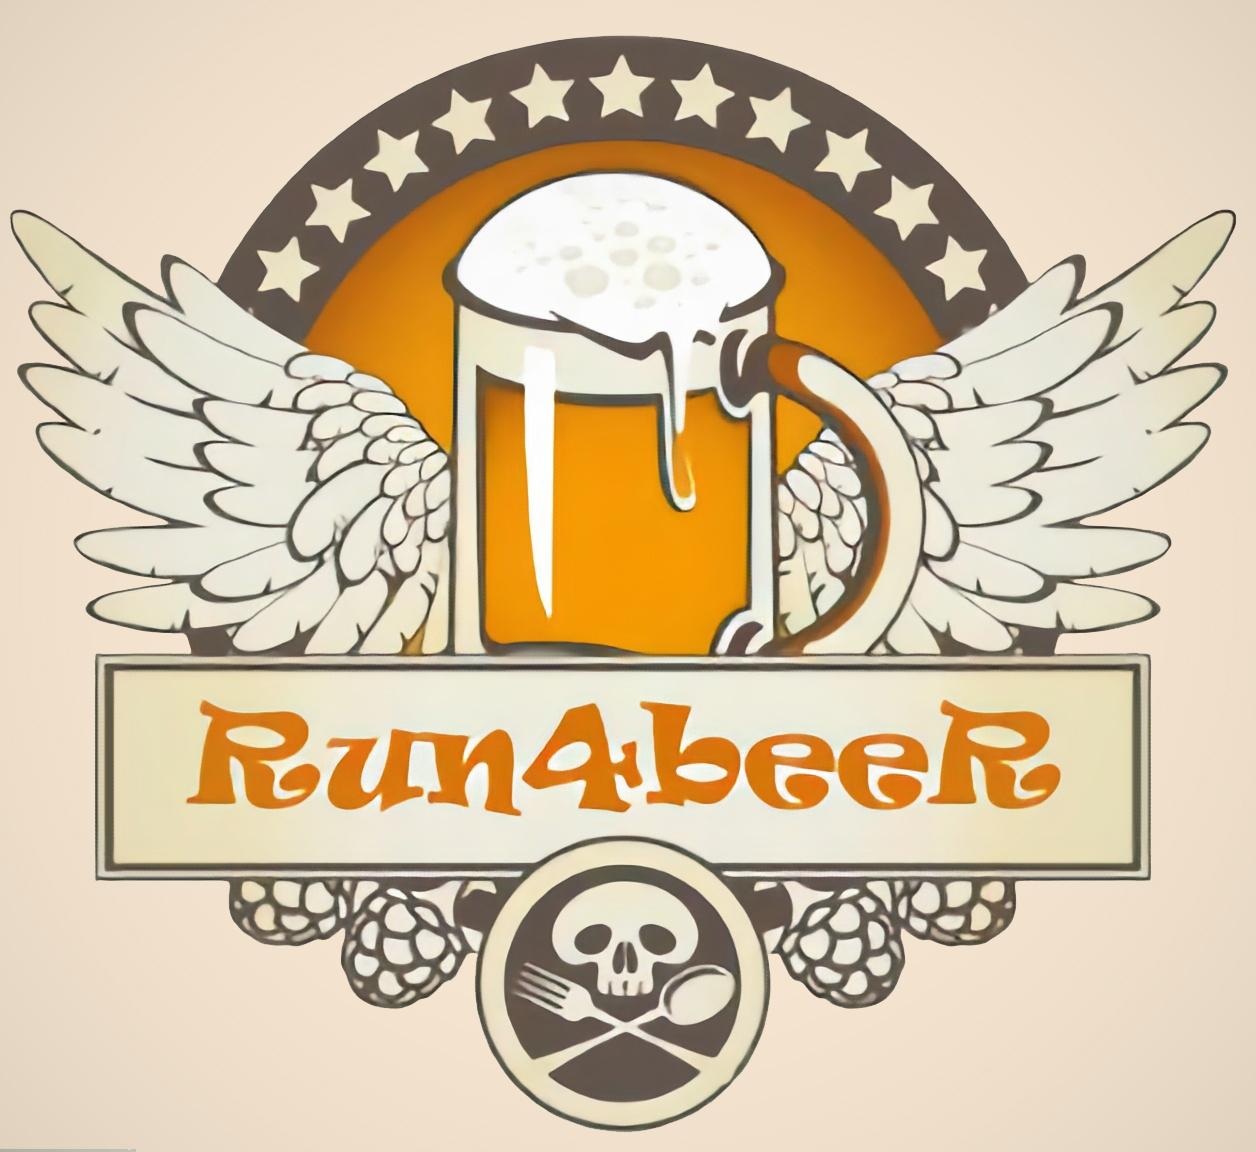 Run4beeR